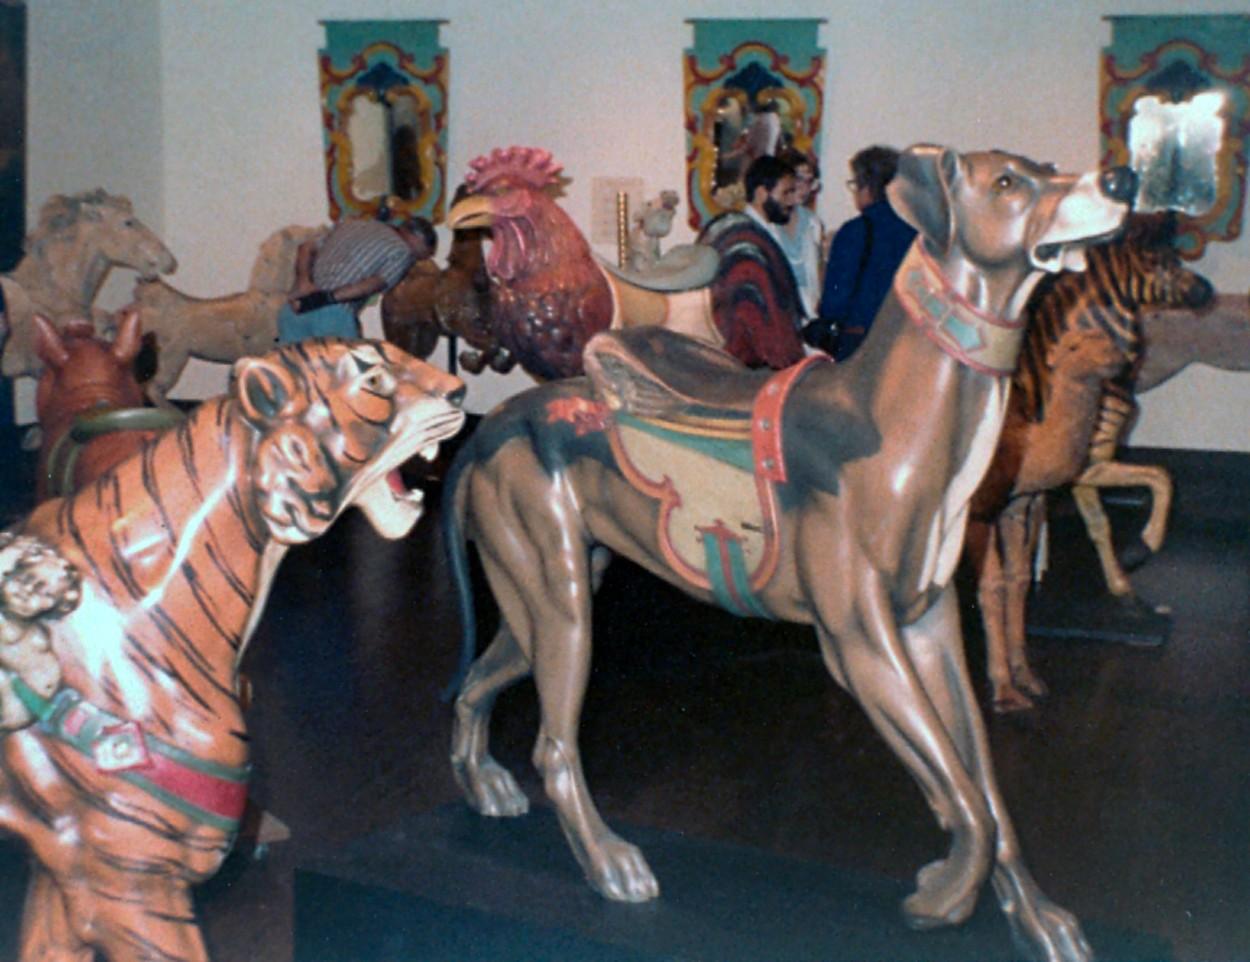 Monterey Art Museum – 1982 Carousel Figure Exhibit